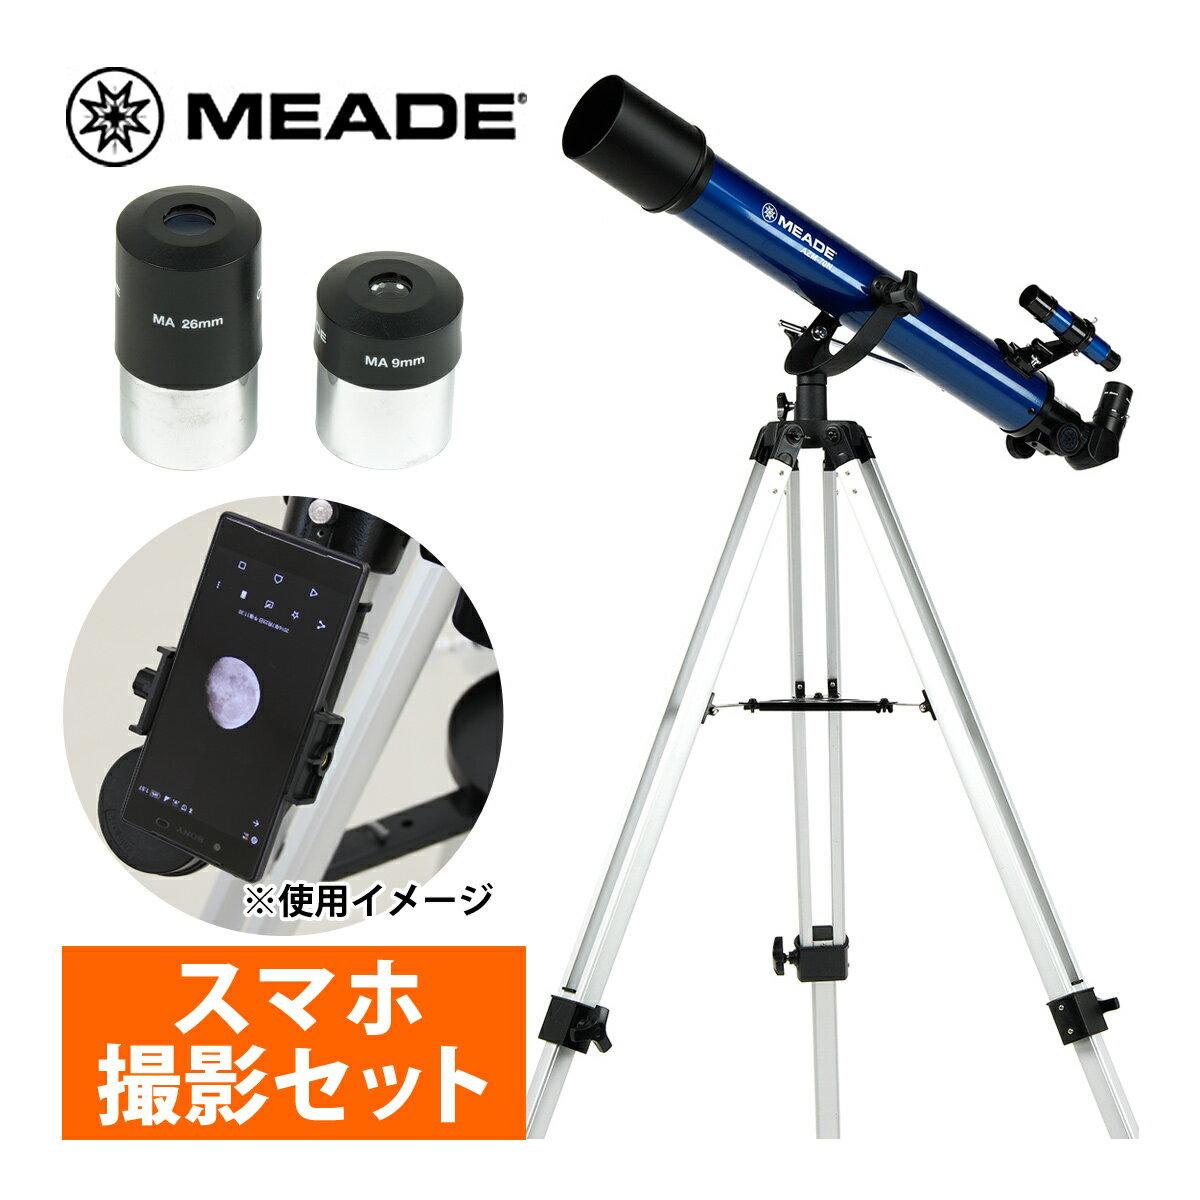 天体望遠鏡 スマホ ミード 初心者 小学生 子供 AZM-70 MEADE 屈折式 経緯台式